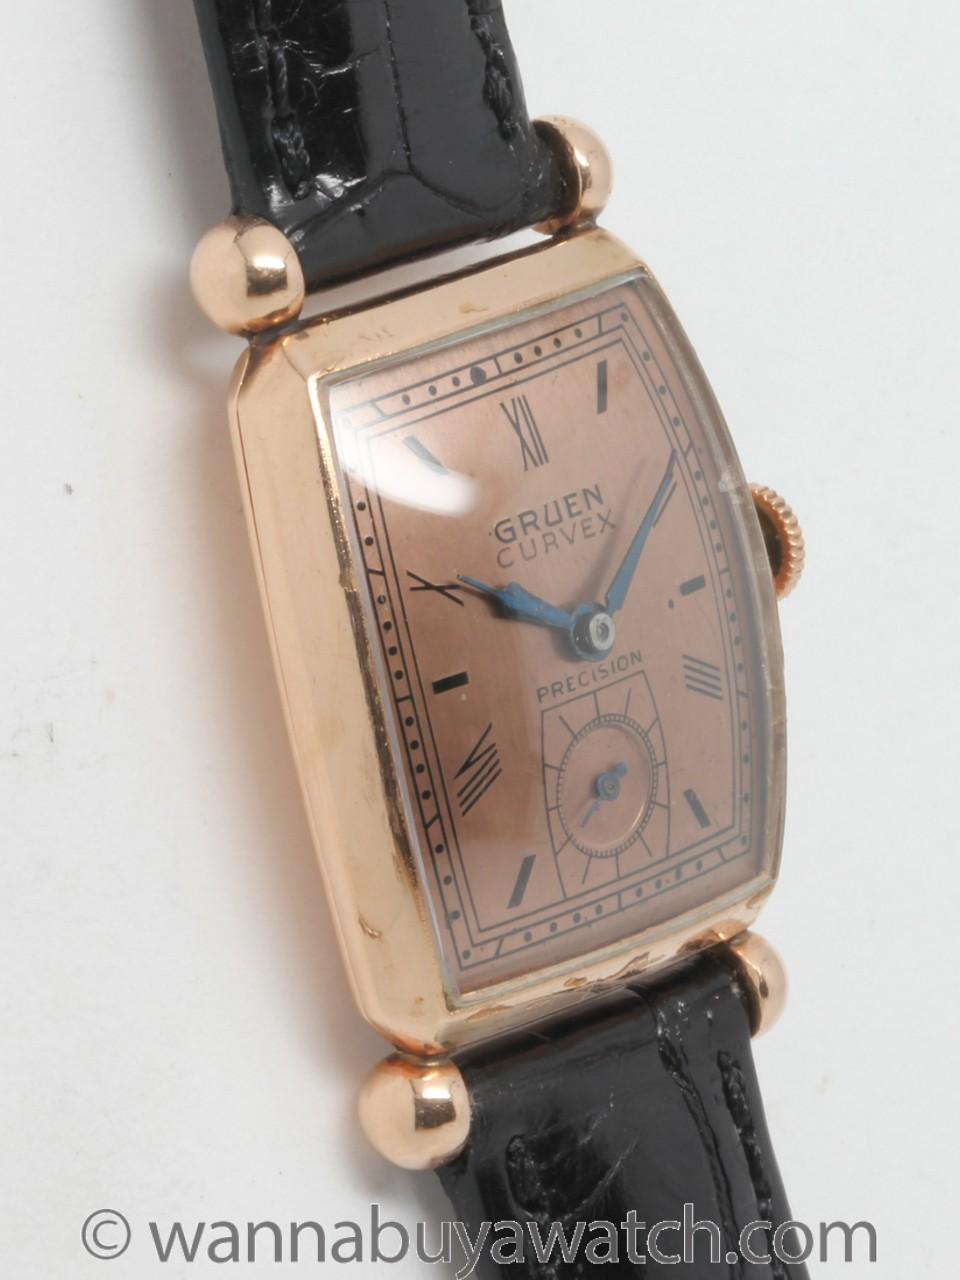 Gruen 14K PG Curvex circa 1940's